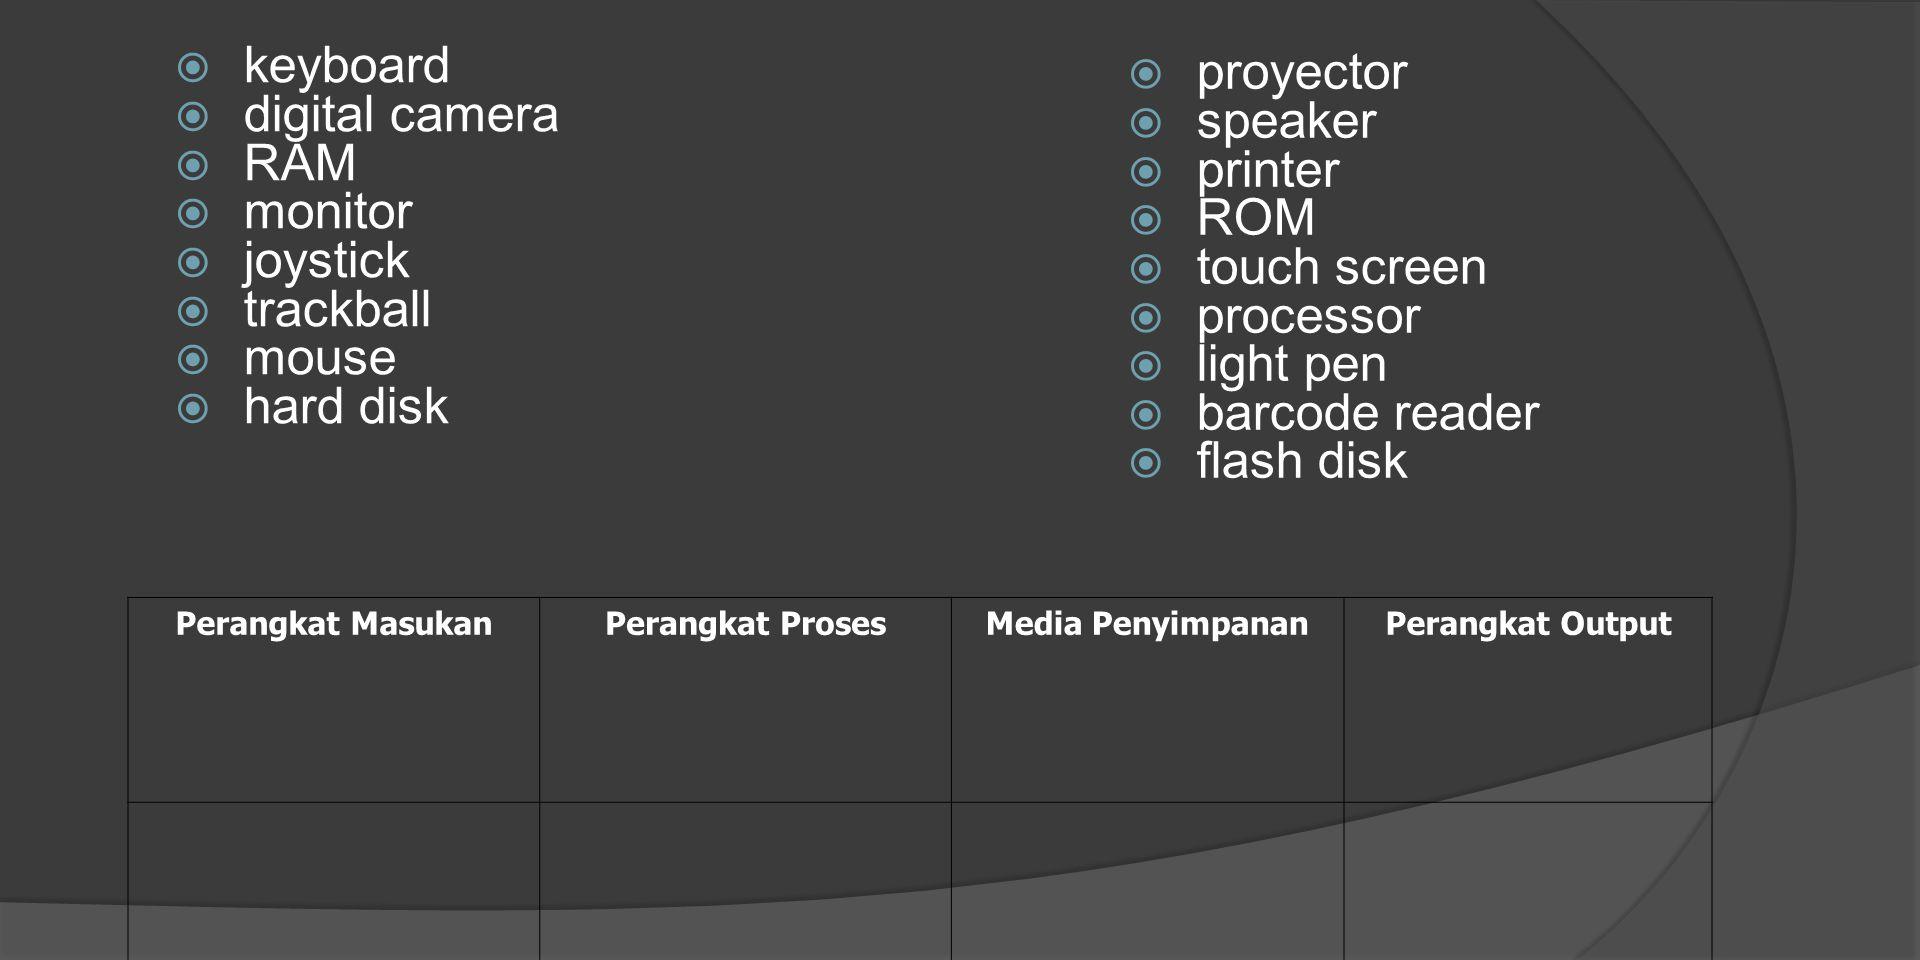  keyboard  digital camera  RAM  monitor  joystick  trackball  mouse  hard disk  proyector  speaker  printer  ROM  touch screen  processor  light pen  barcode reader  flash disk Perangkat MasukanPerangkat ProsesMedia PenyimpananPerangkat Output